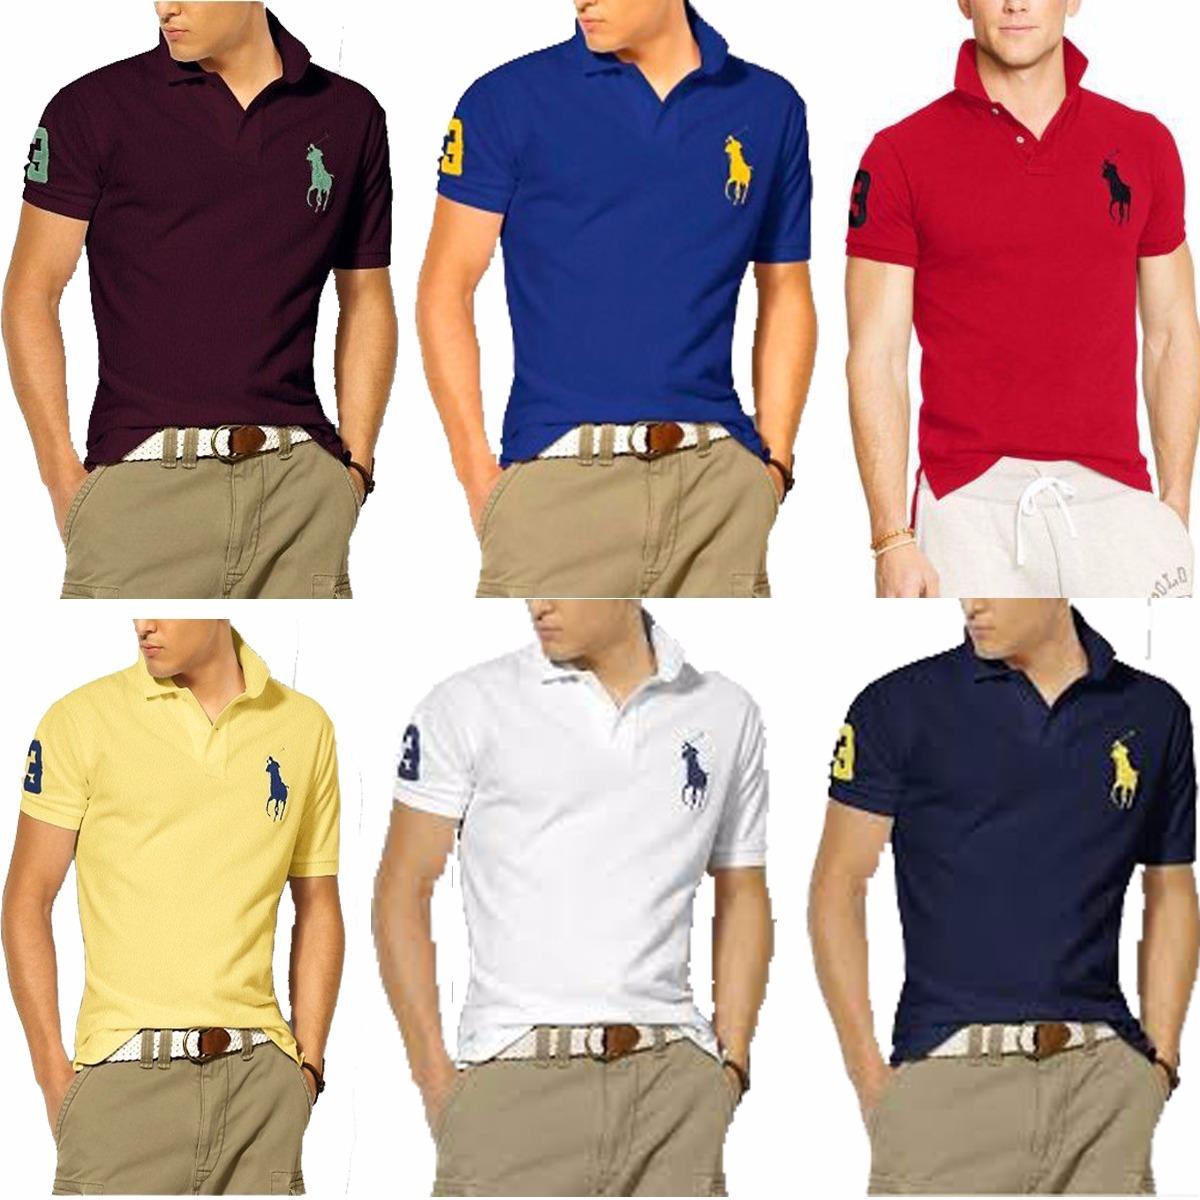 52496110b1 Kit 06 Camisas Camisetas Gola Polo Masculina Atacado Revenda - R ...